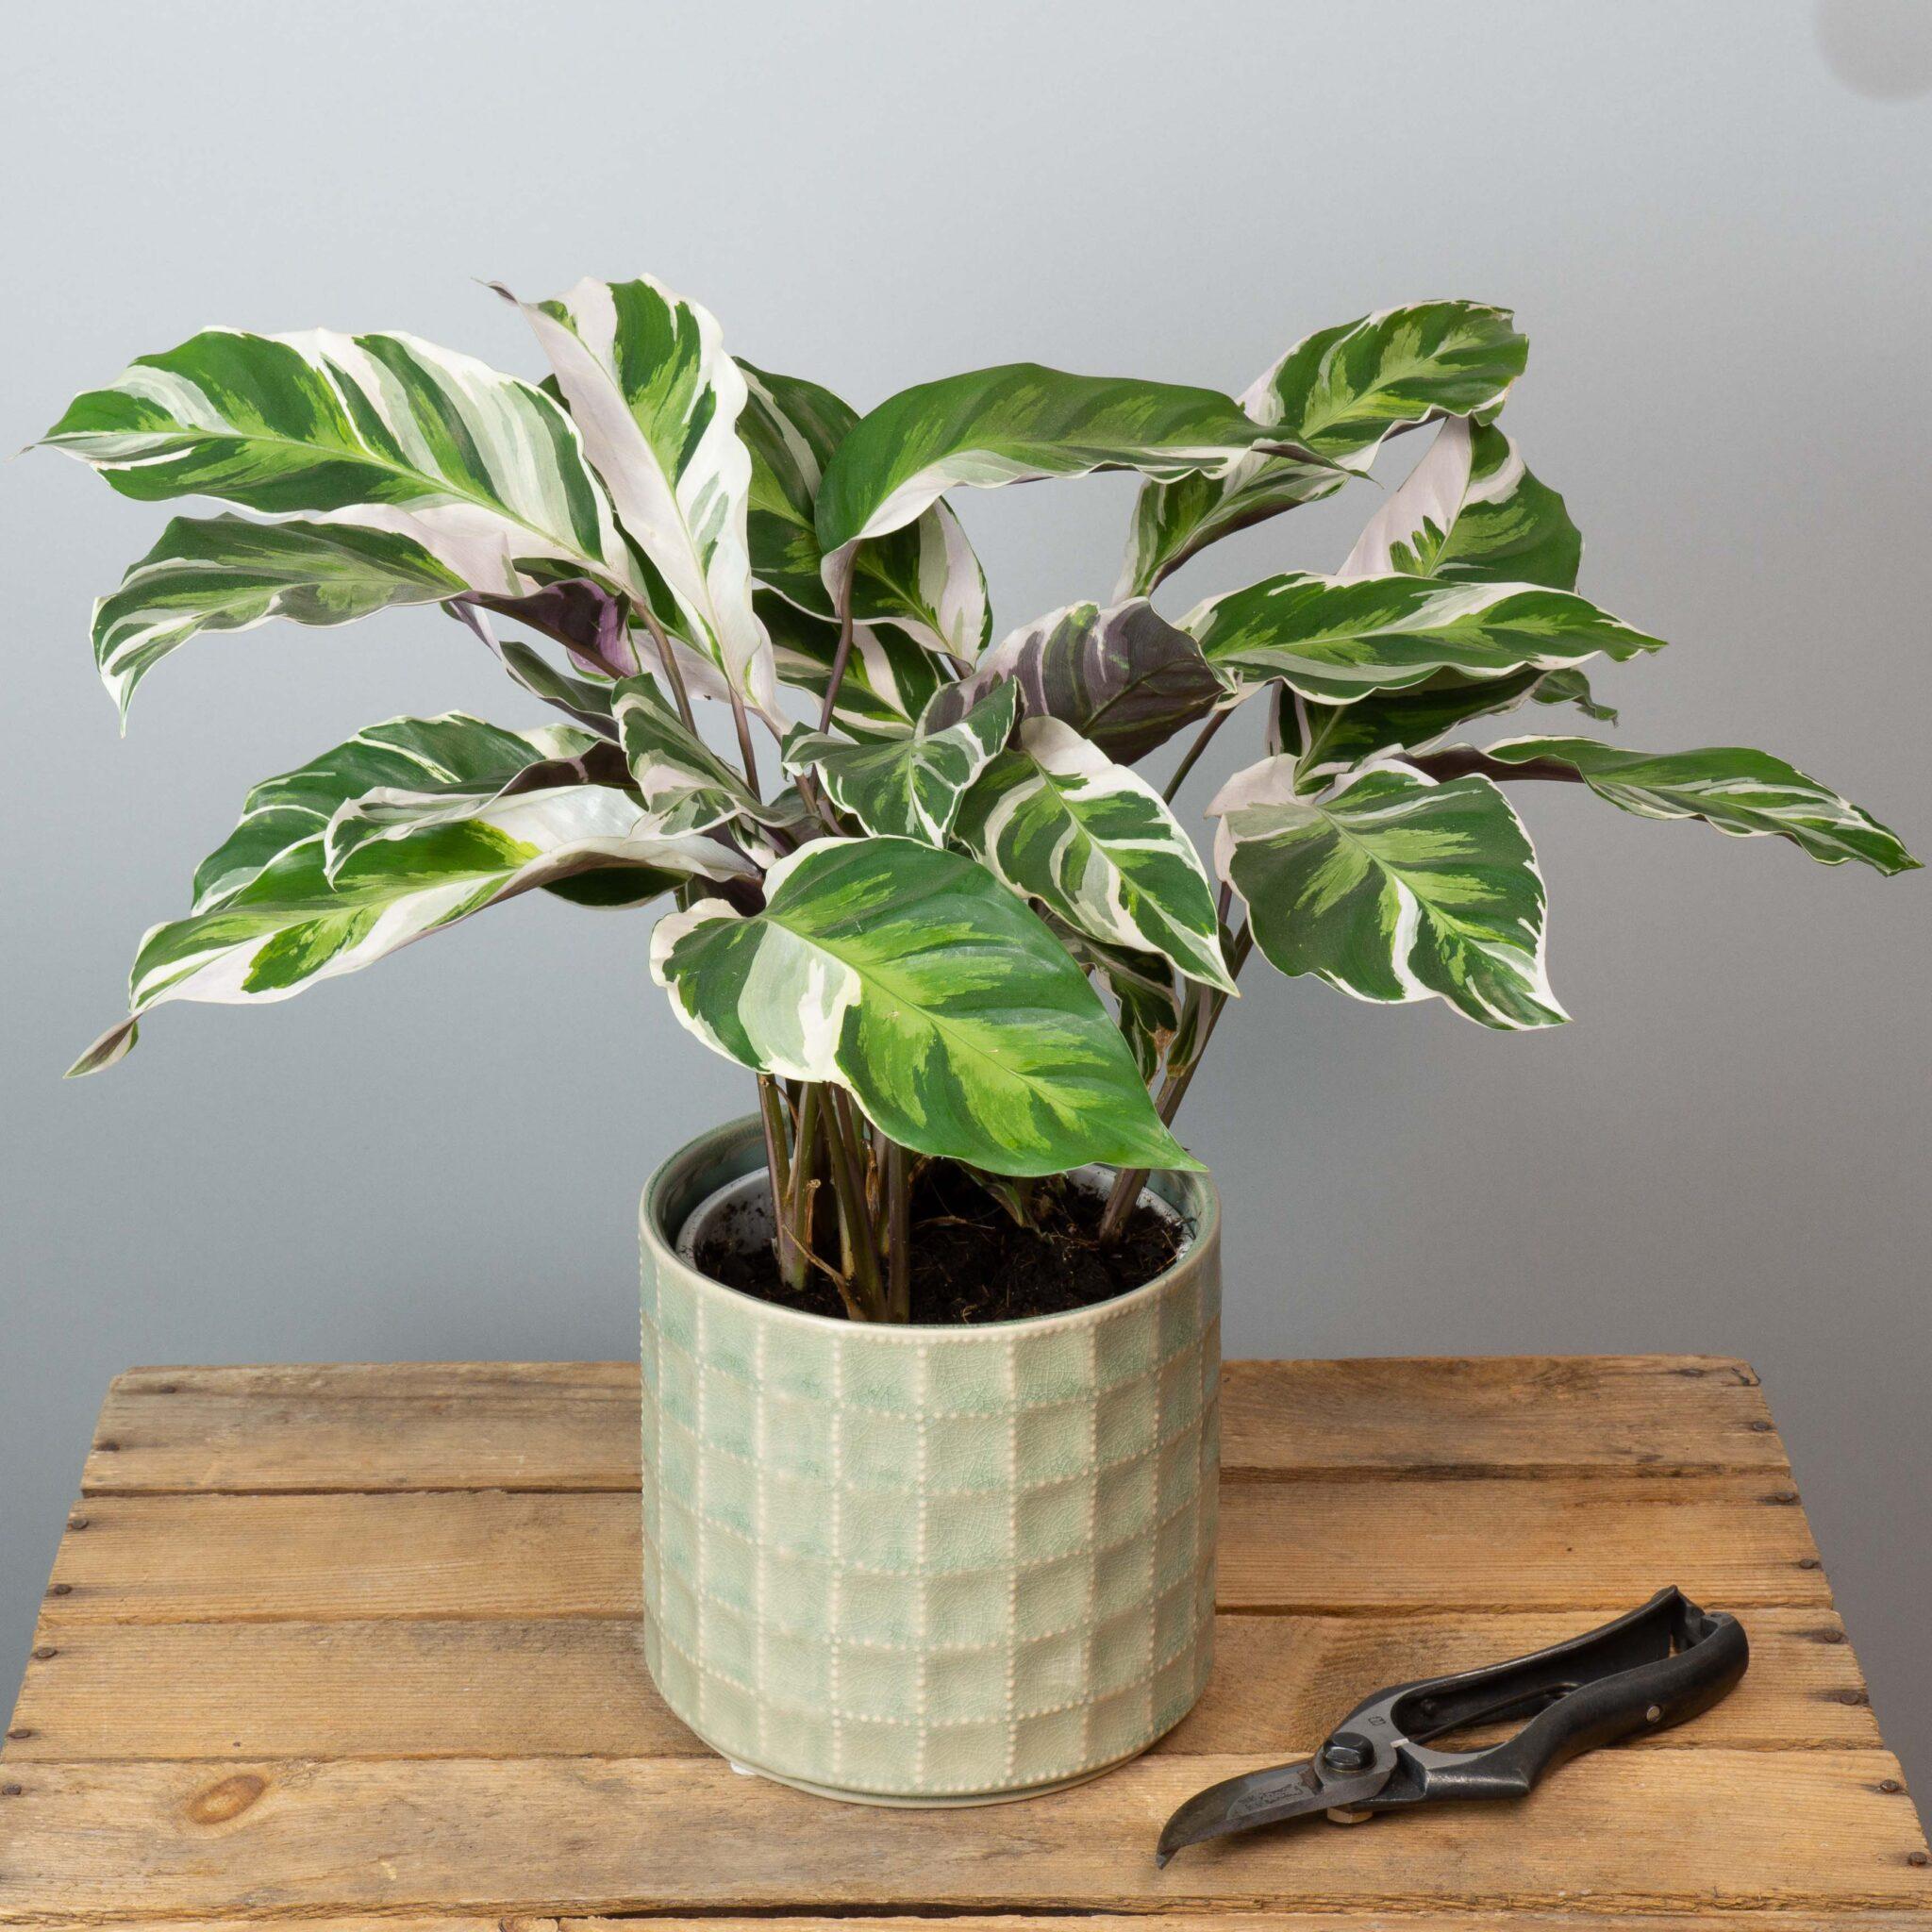 plante-verte-surprise-65-euros-atelier-lavarenne-fleuriste-lyon-4